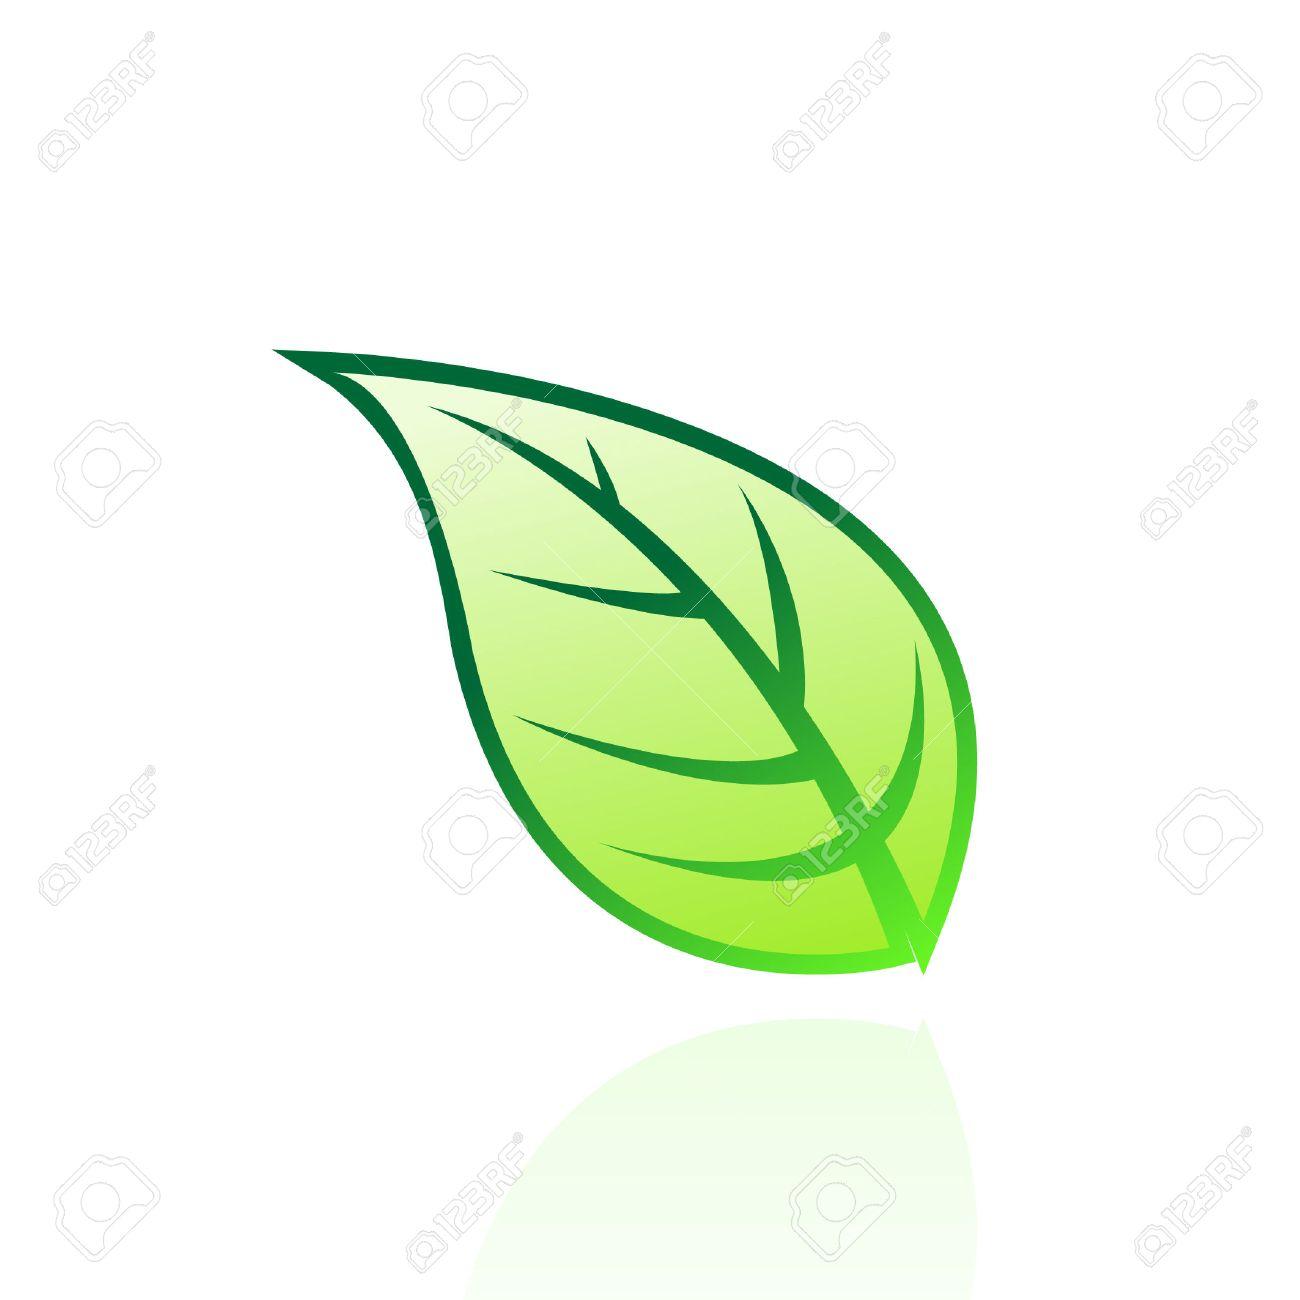 Verdes Logos Imágenes Hoja Logo Hoja Verde